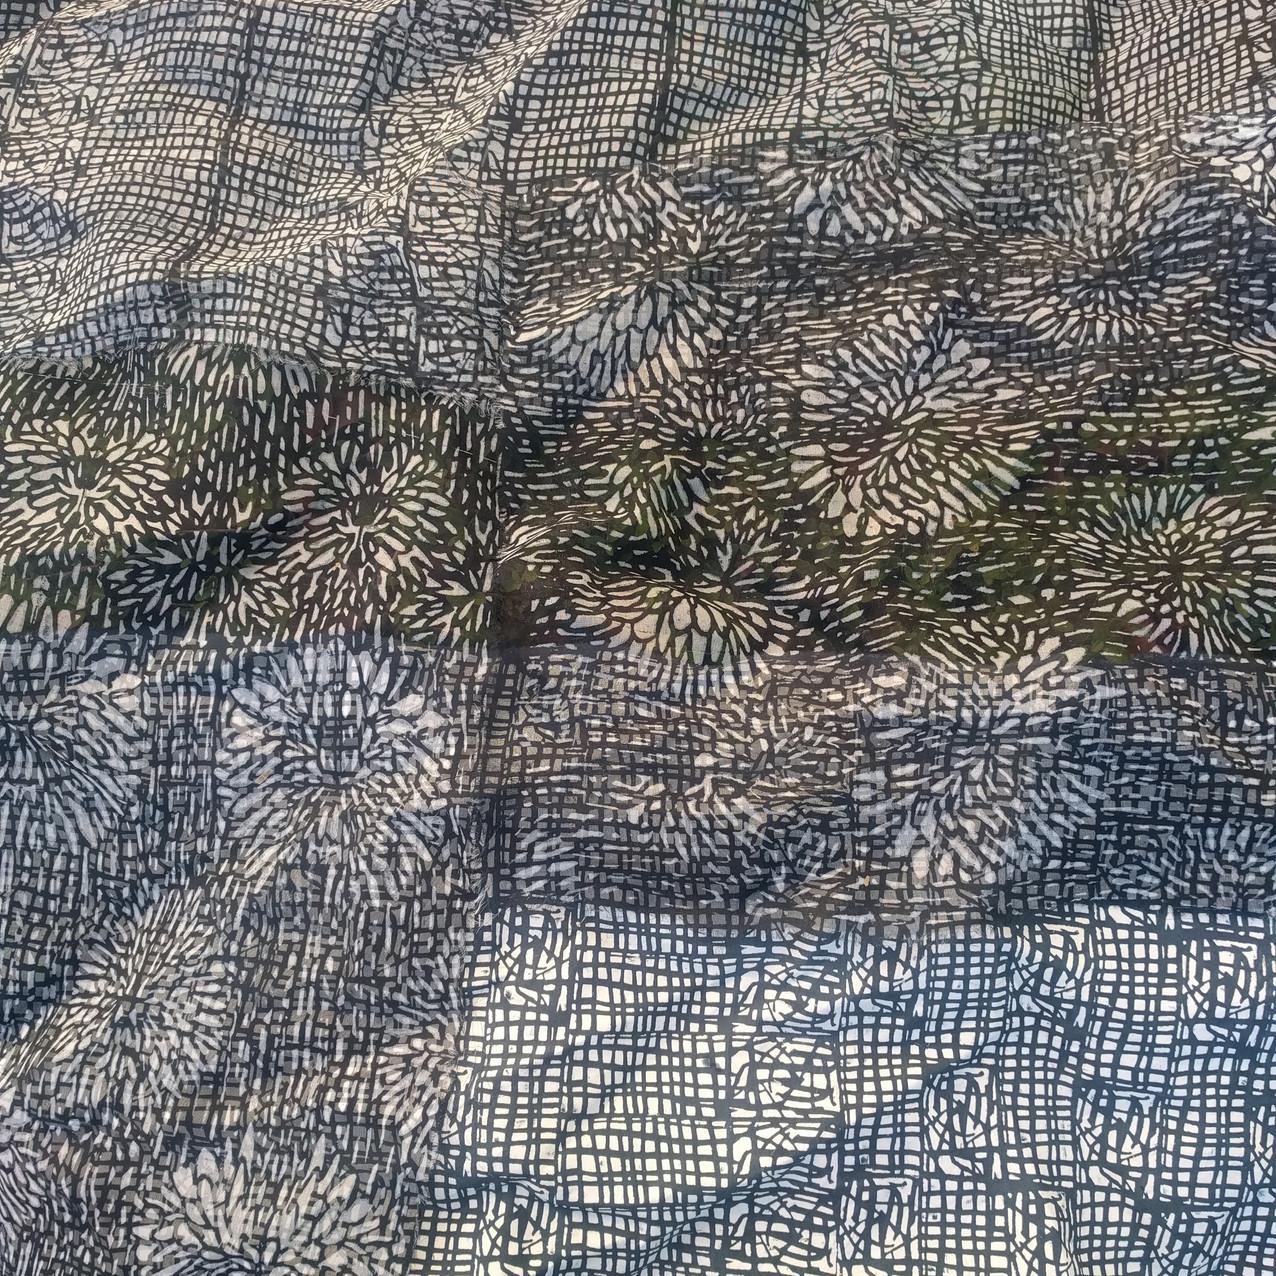 SD work Layered transparent silks